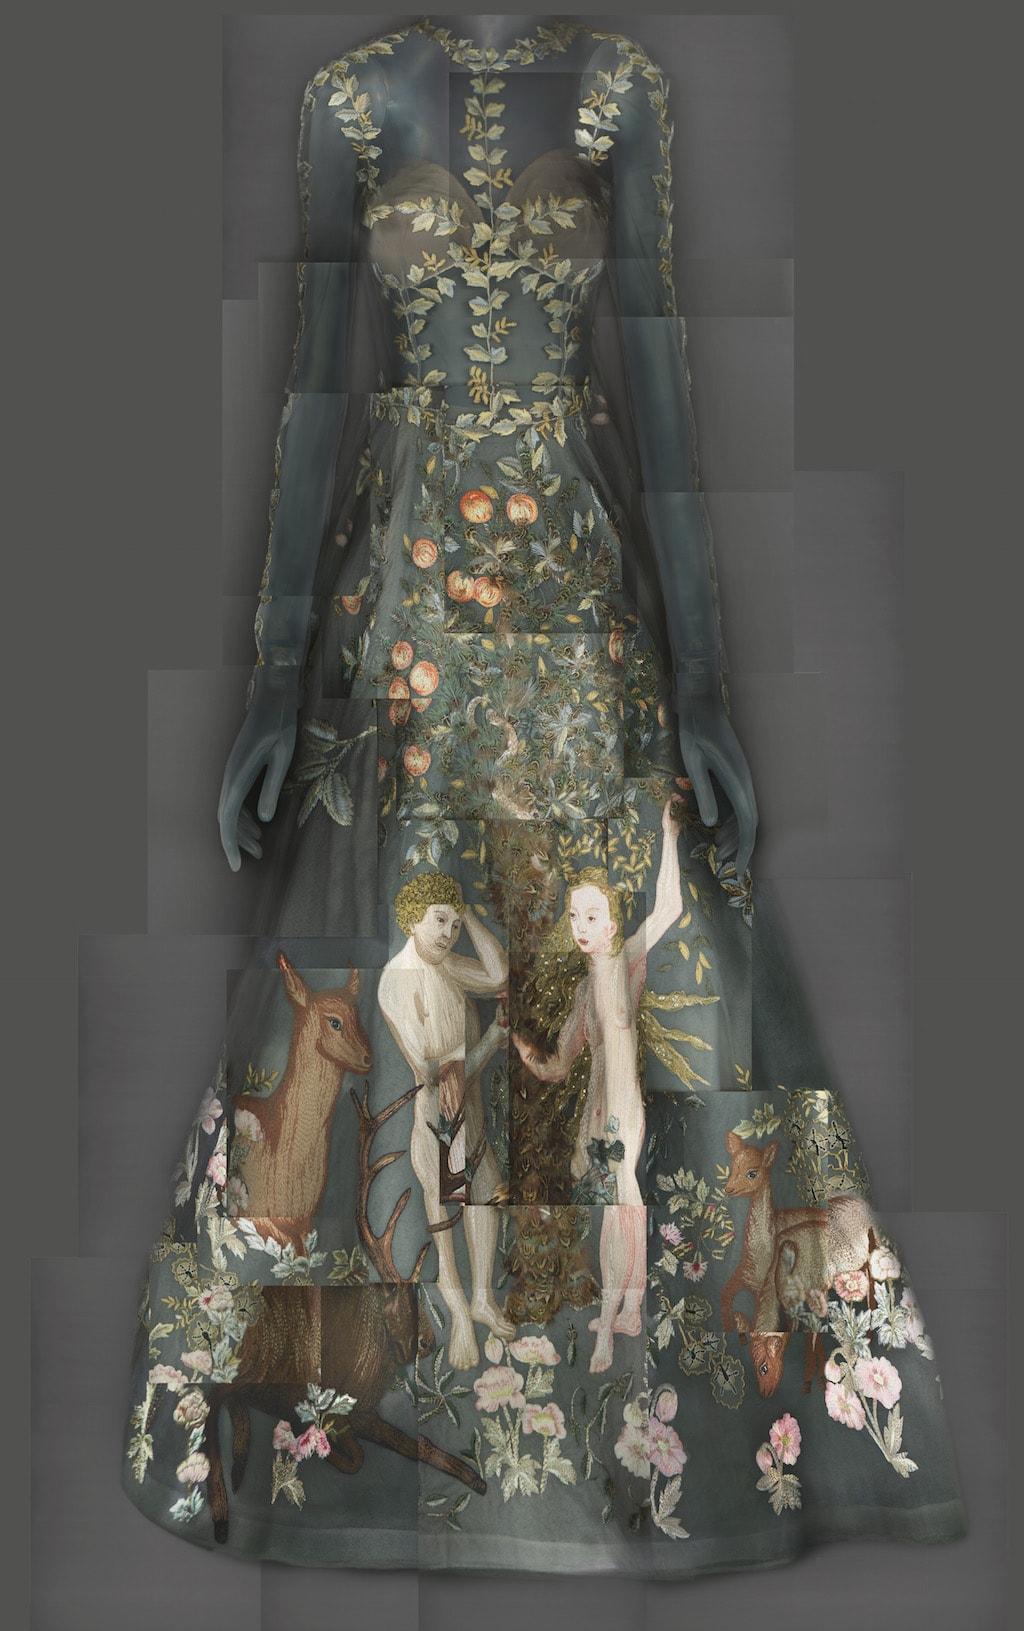 Evening Dress, Maria Grazia Chiuri and Pierpaolo Piccioli for Valentino, spring/summer 2014 haute couture; Courtesy of Valentino S.p.A. Image courtesy of The Metropolitan Museum of Art, Digital Composite Scan by Katerina Jebb